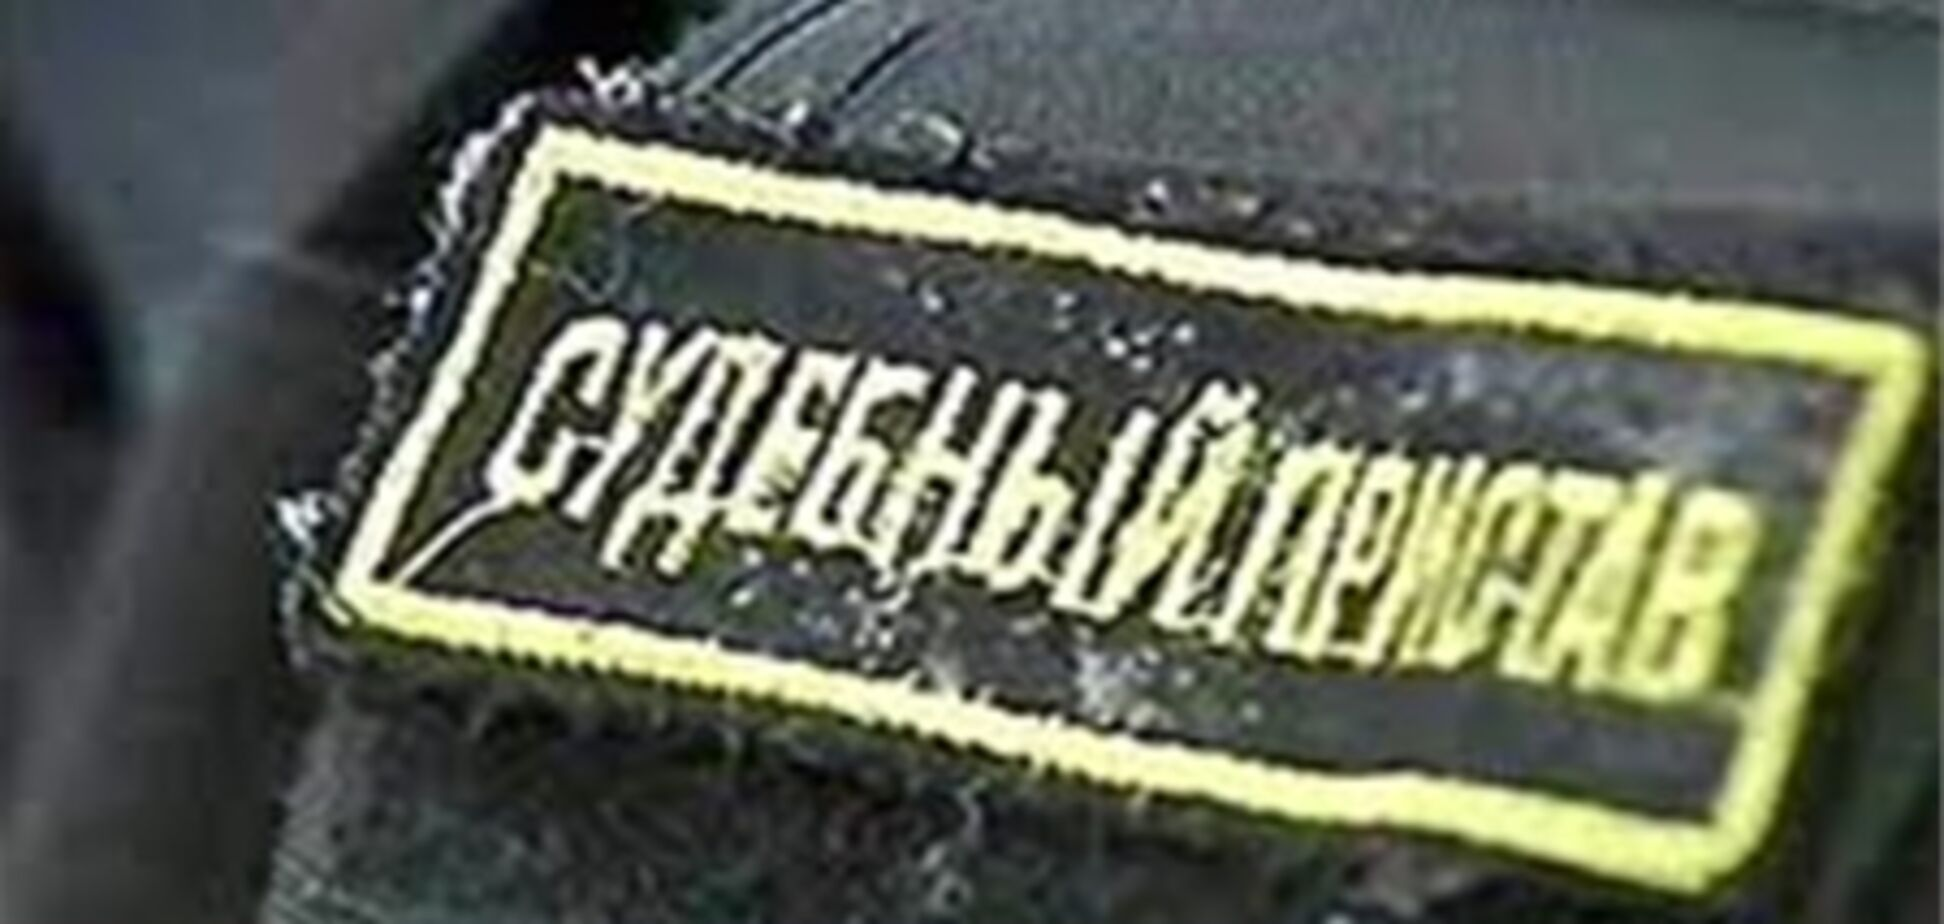 LIVE. Судебные приставы забрали машину у депутата. ВИДЕО